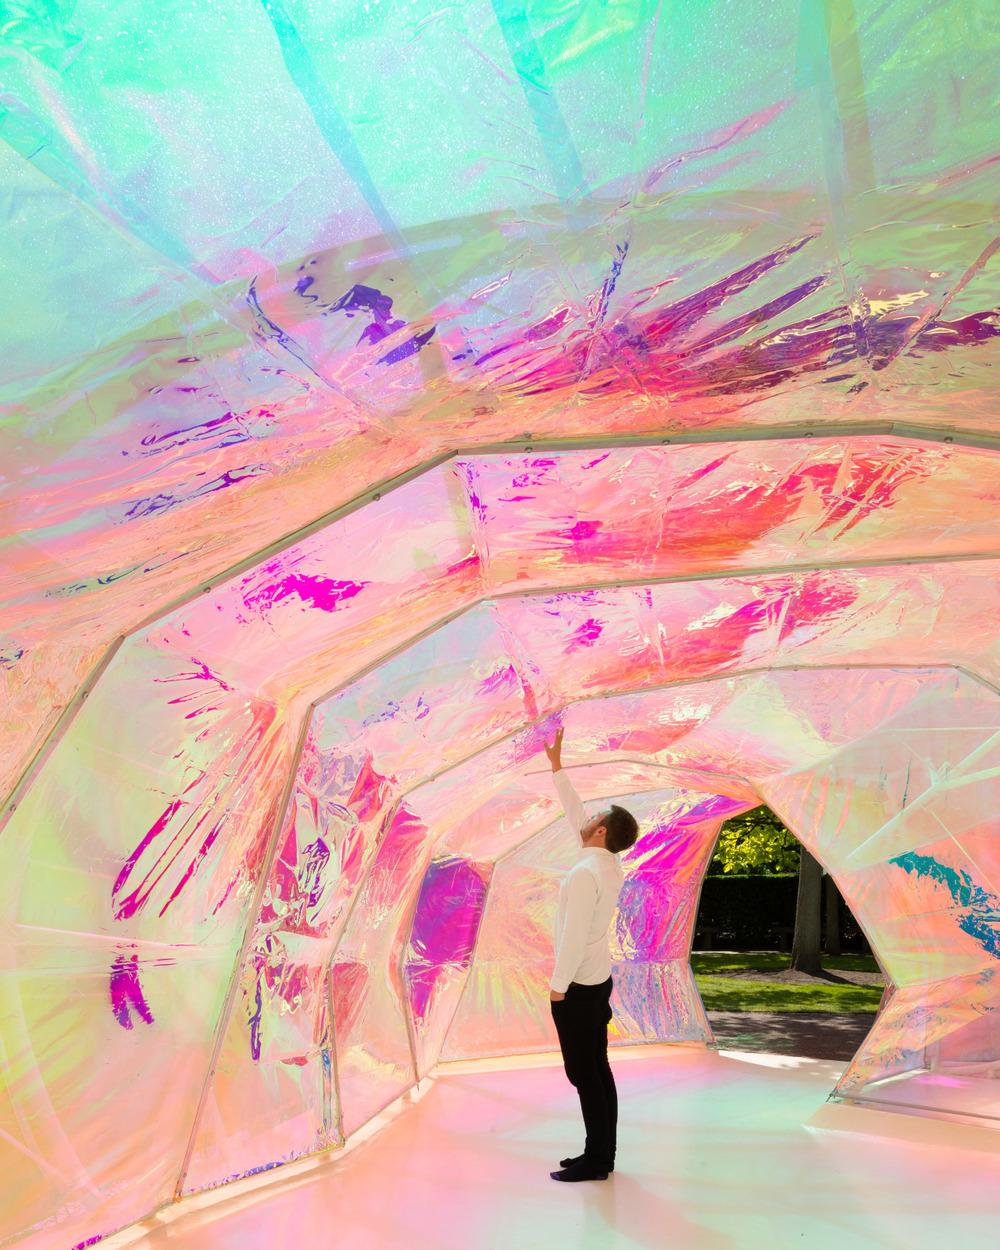 Inside the Serpentine Pavilion designed by selgascano